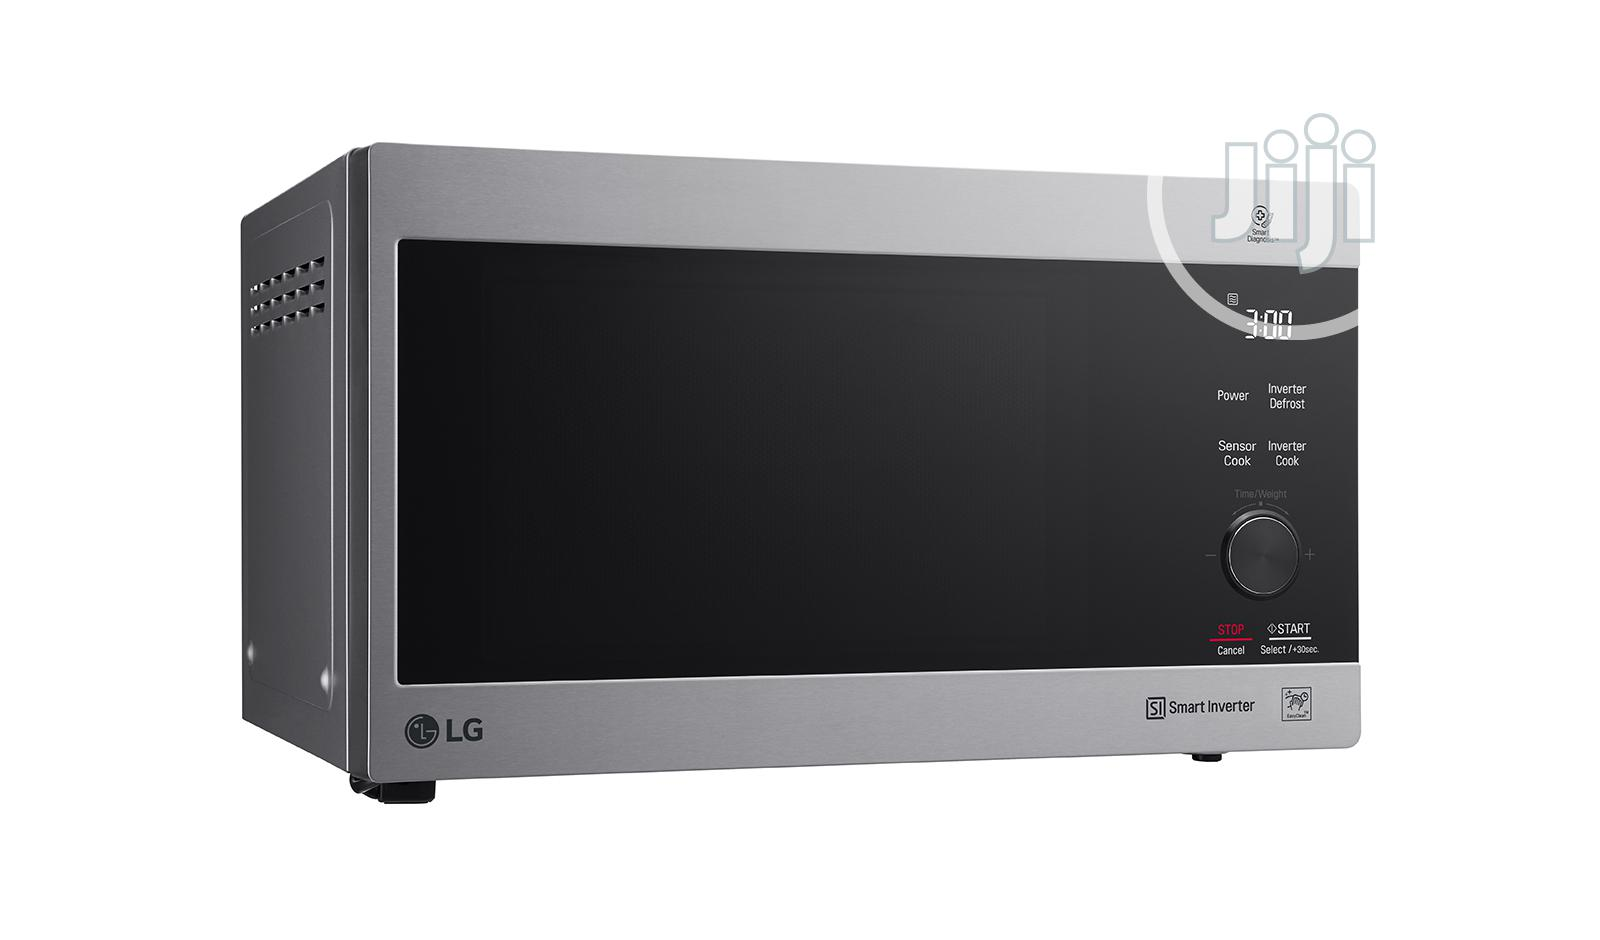 LG Microwave Oven MWO 8265 CIS